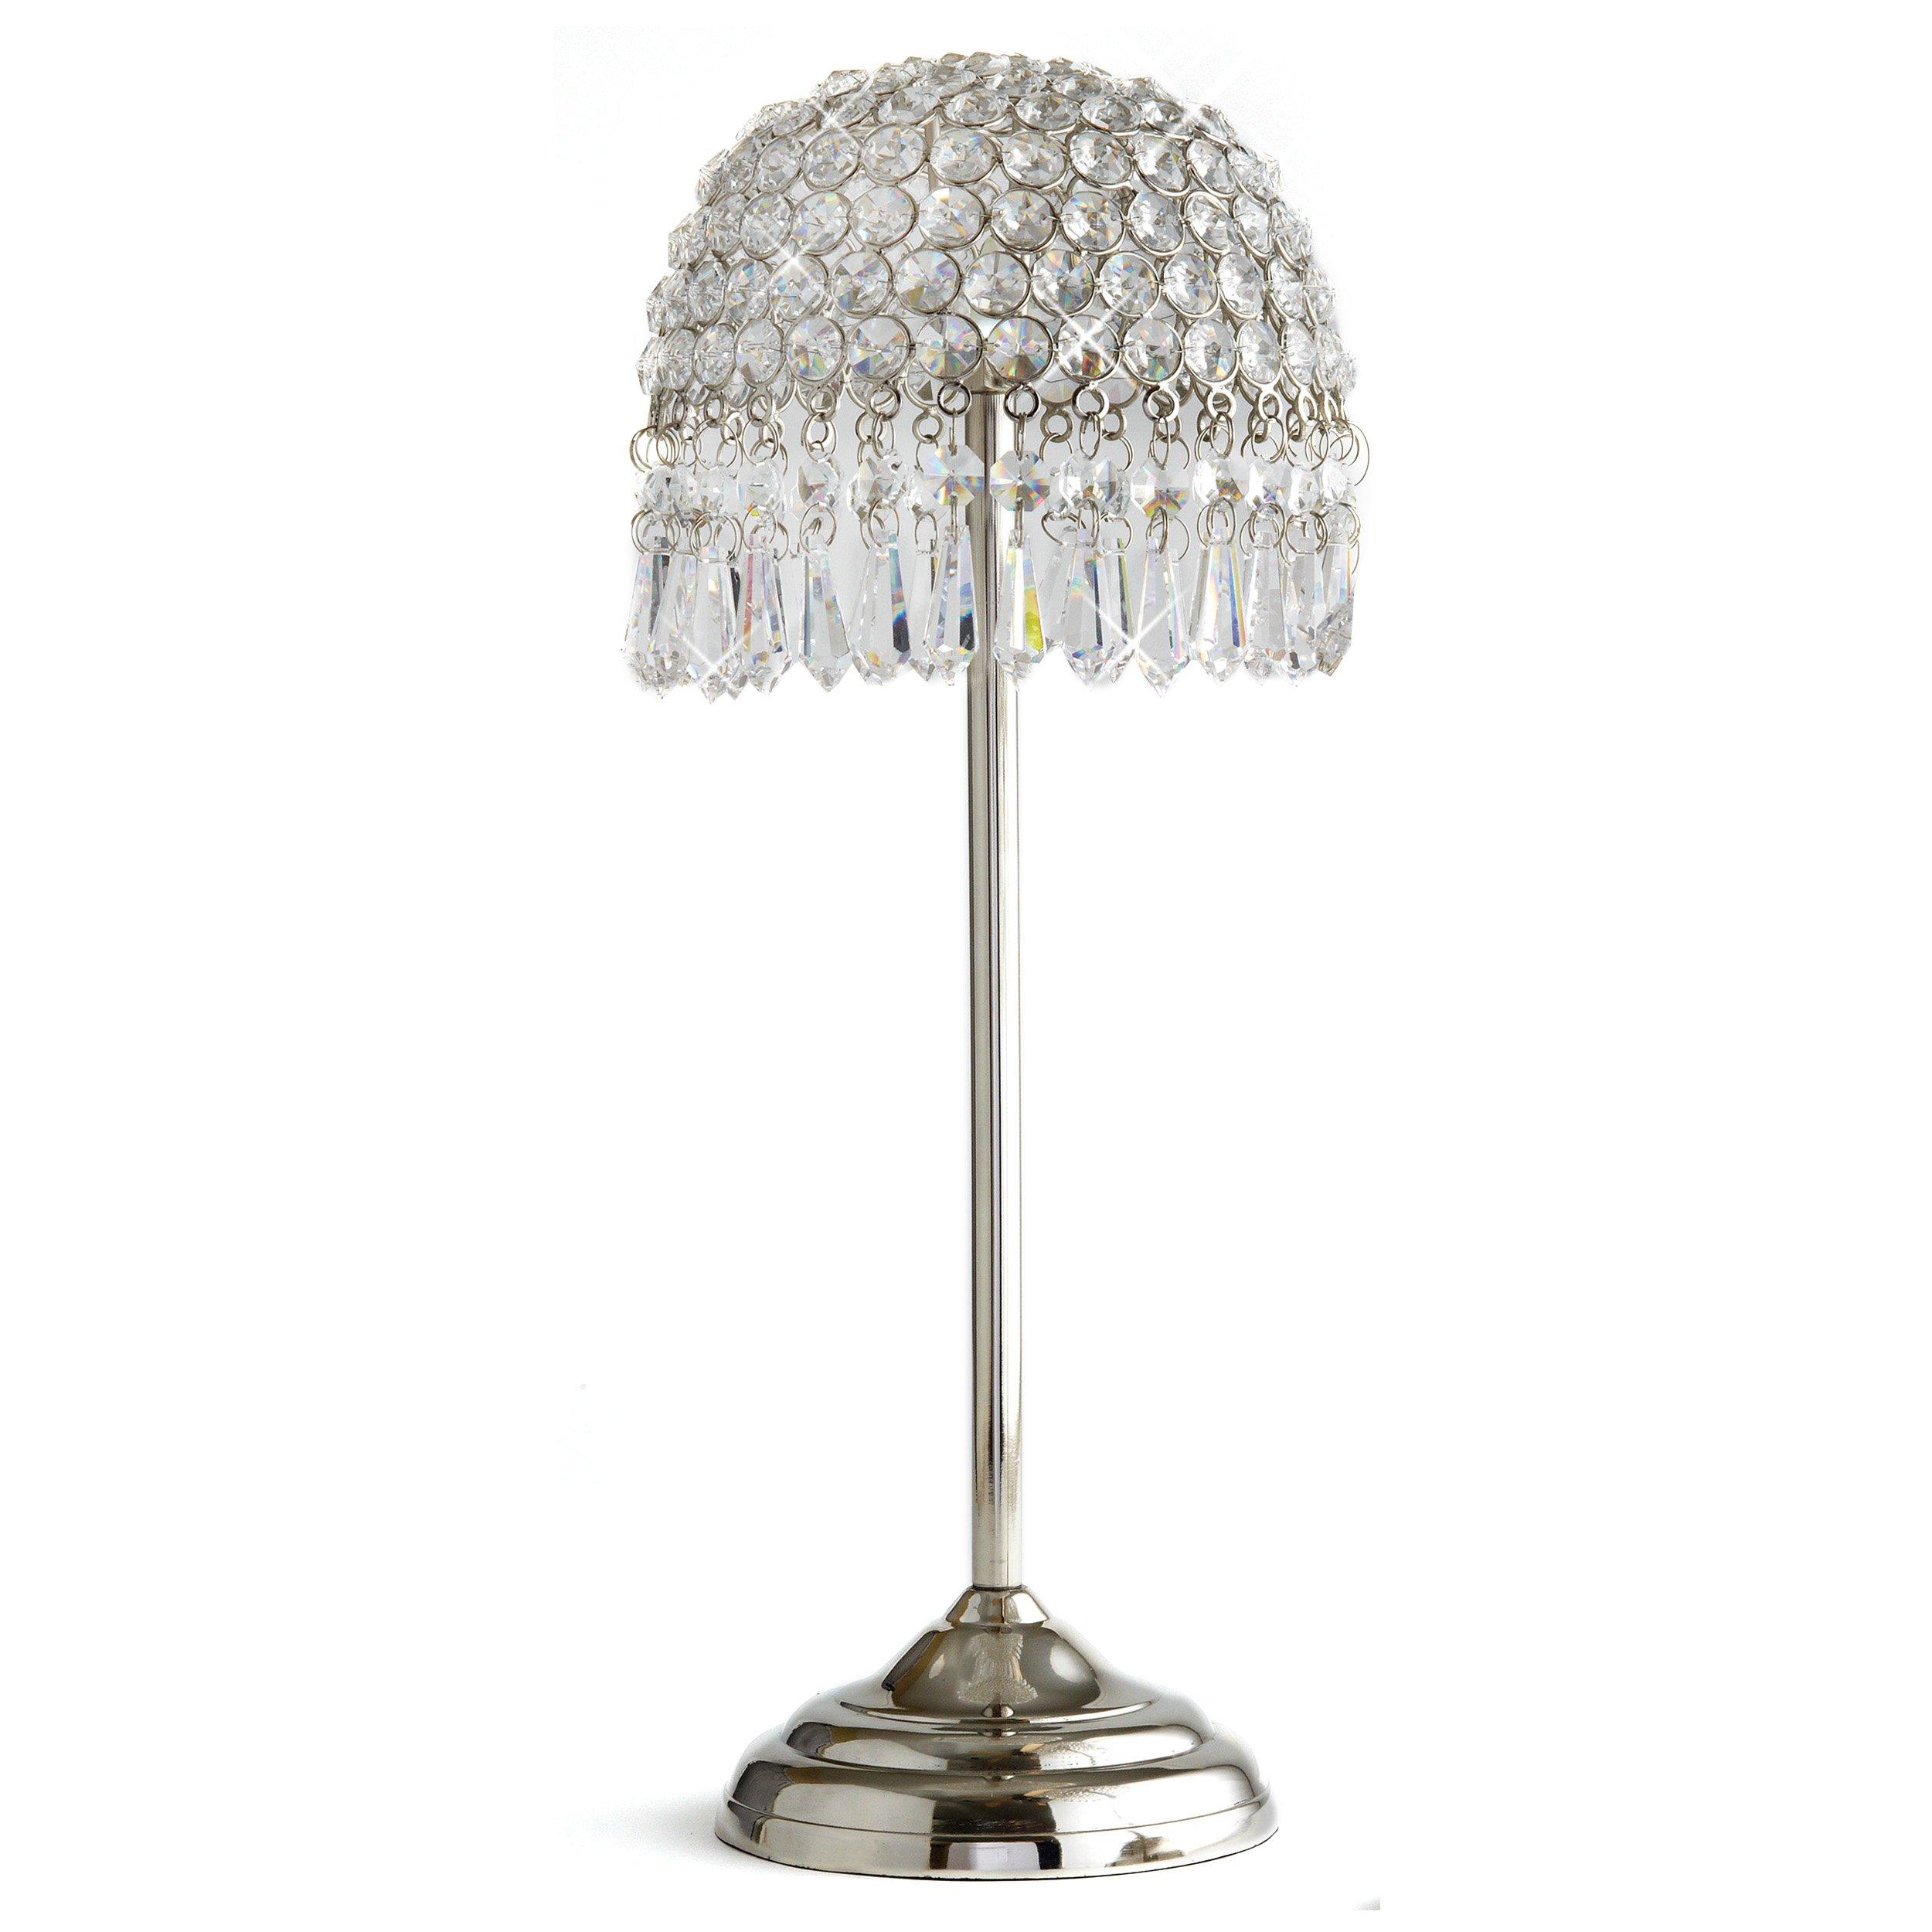 Elegance Sparkle LED Candle Lamp, 17.5-Inch